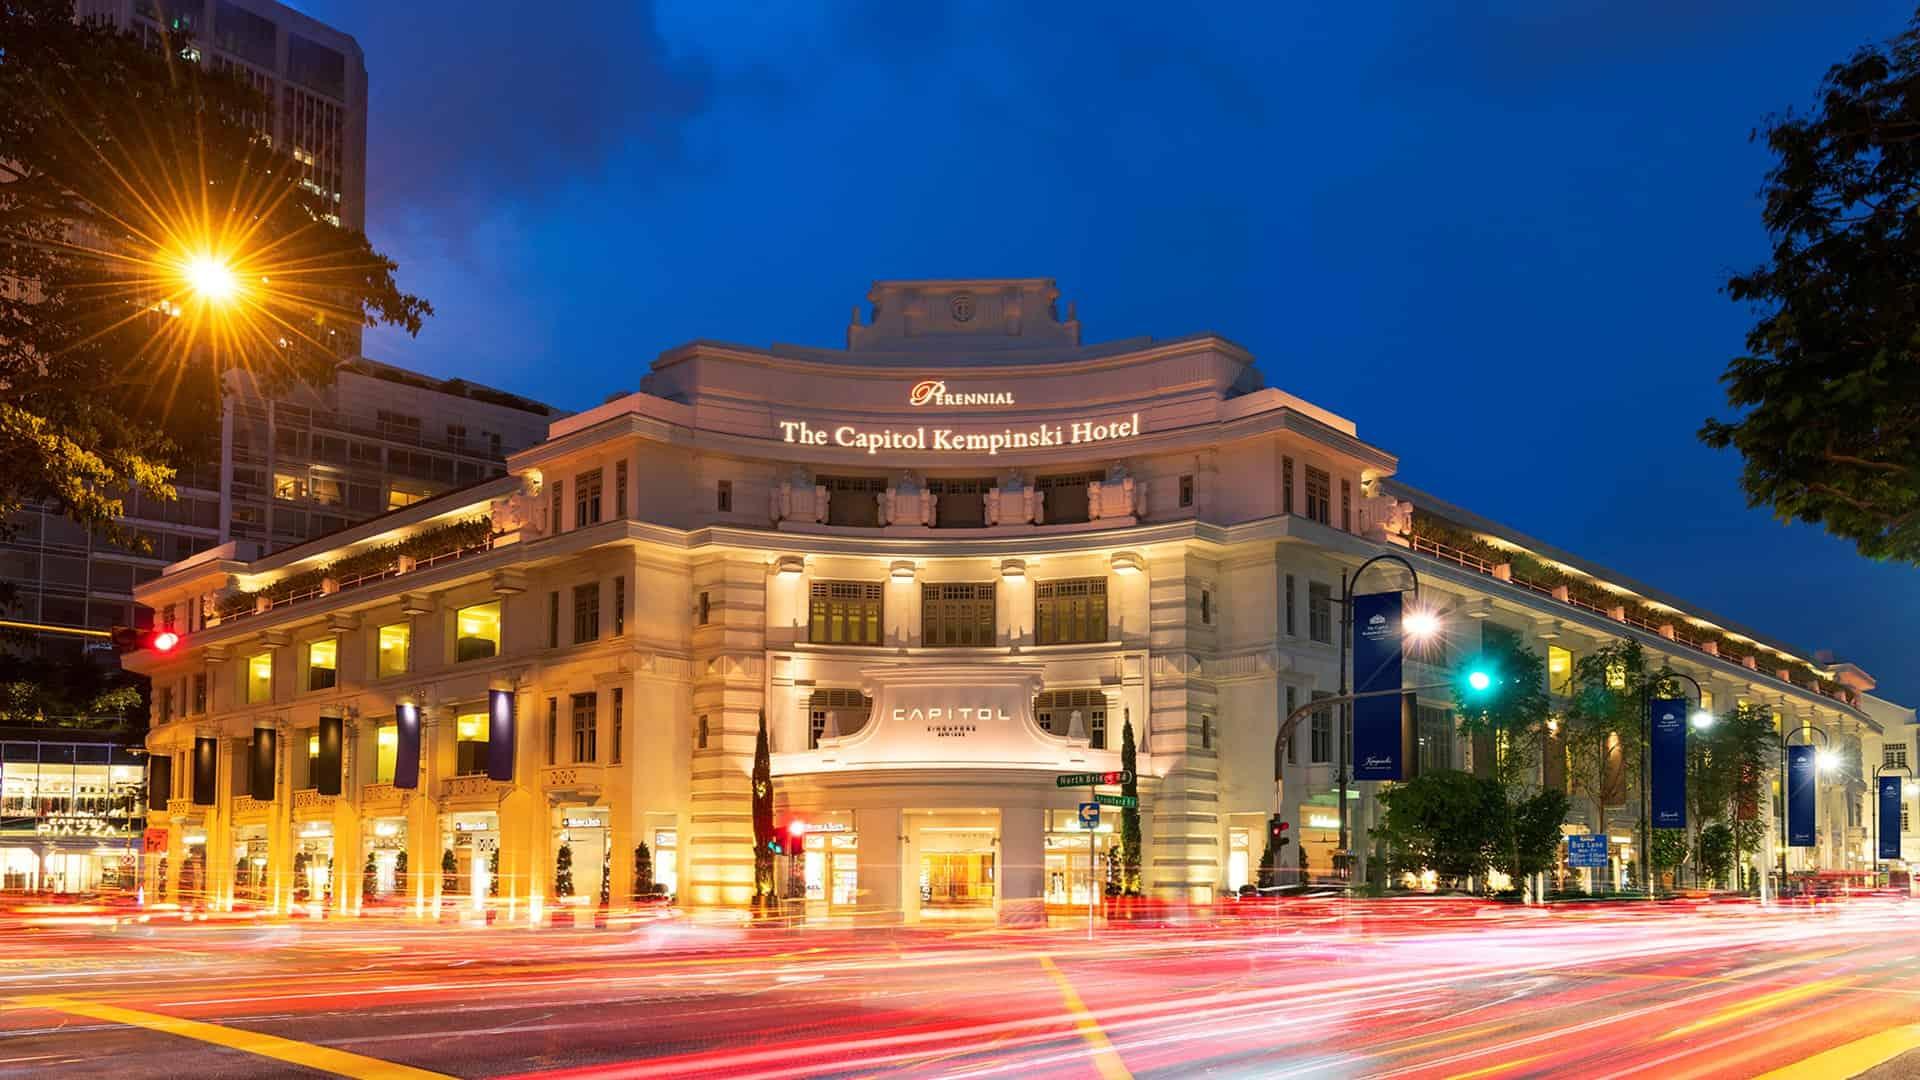 The Capitol Kempinski Hotel Singapore Exterior View